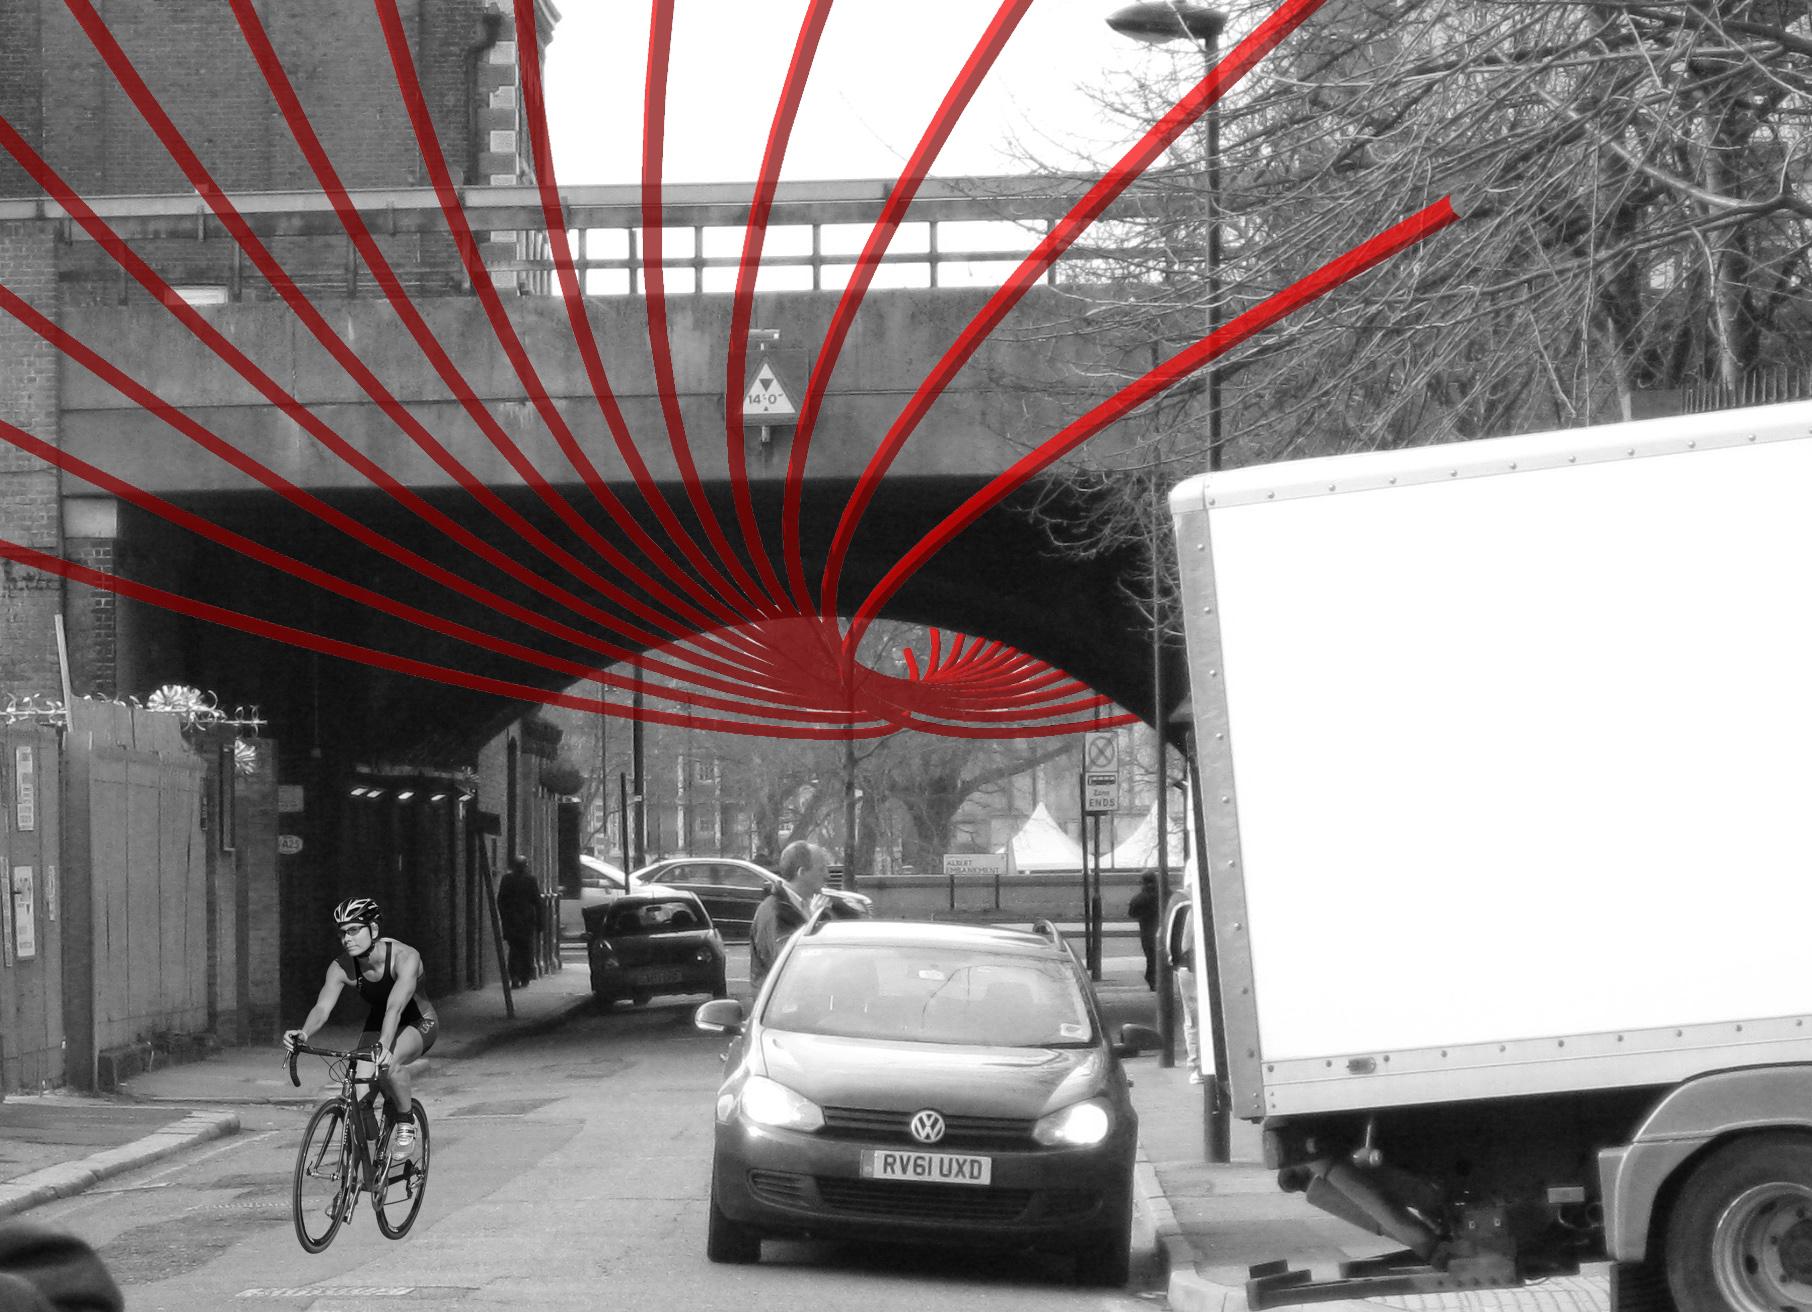 Vauxhall photomontage_06.jpg